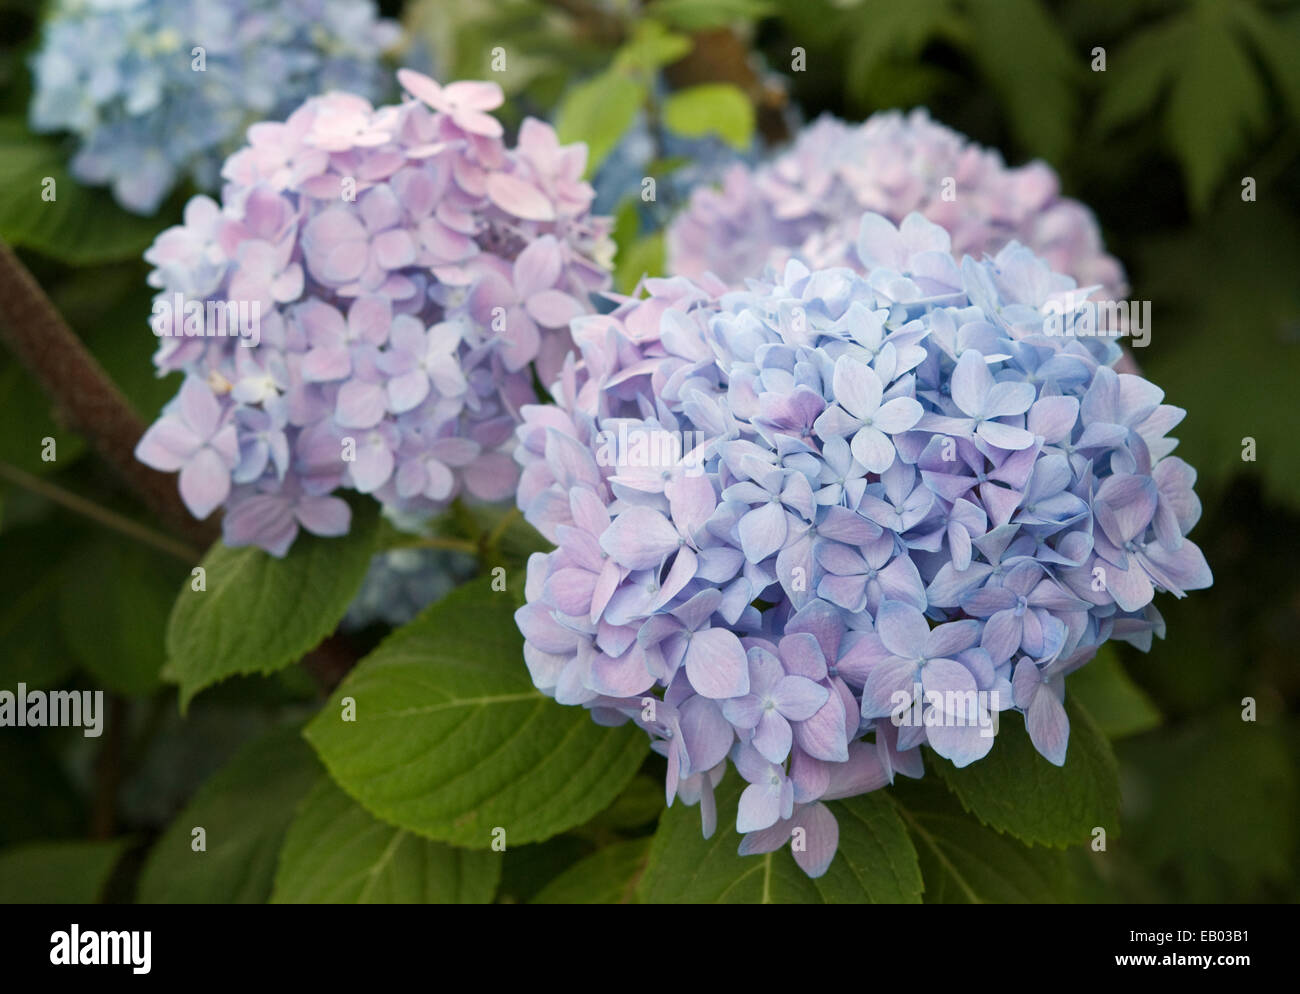 MOPHEAD HYDRANGEA - HYDRANGEA MACROPHYLLA 'ENDLESS SUMMER' - Stock Image